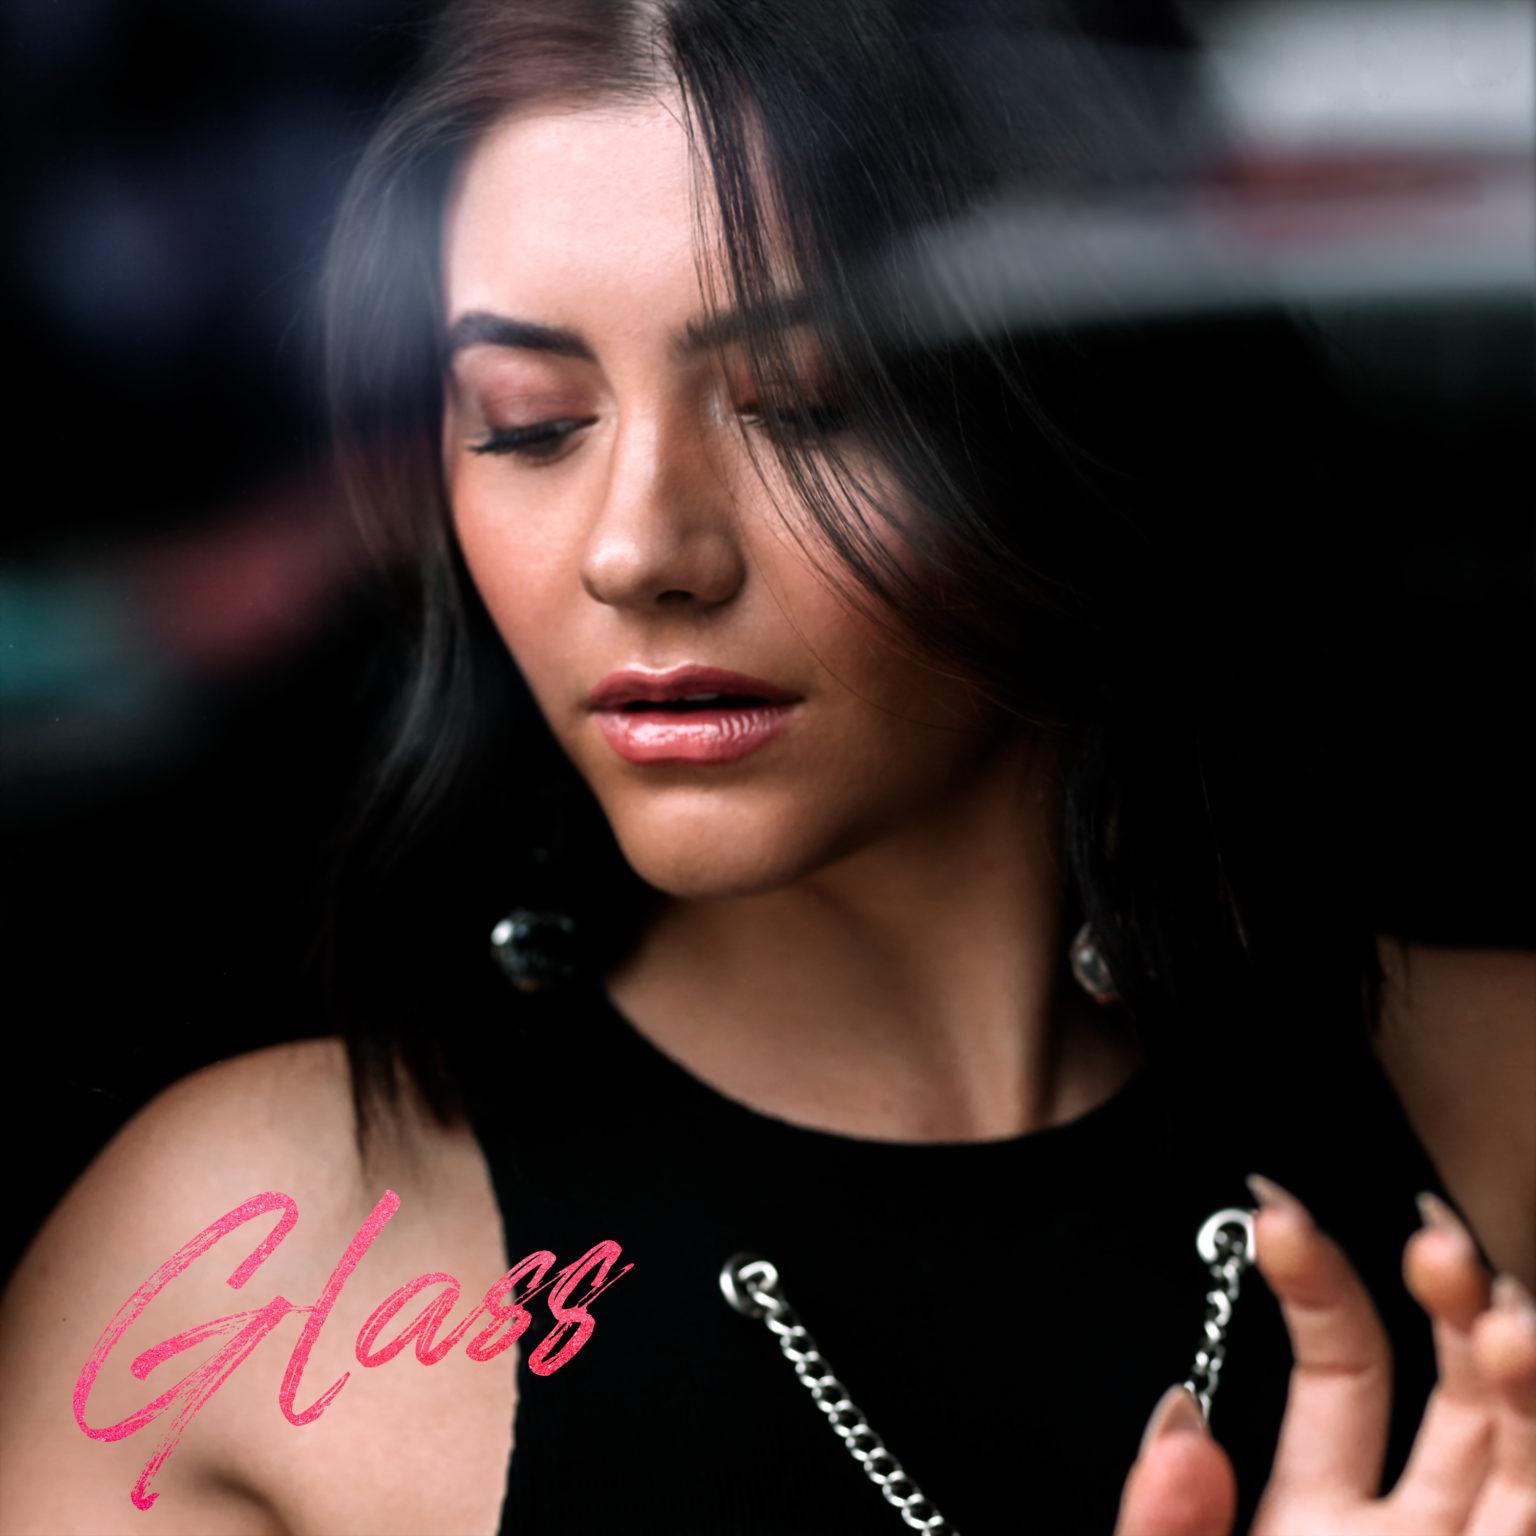 ET Canada Behind The Scenes, Ana Golja Glass Music Video.